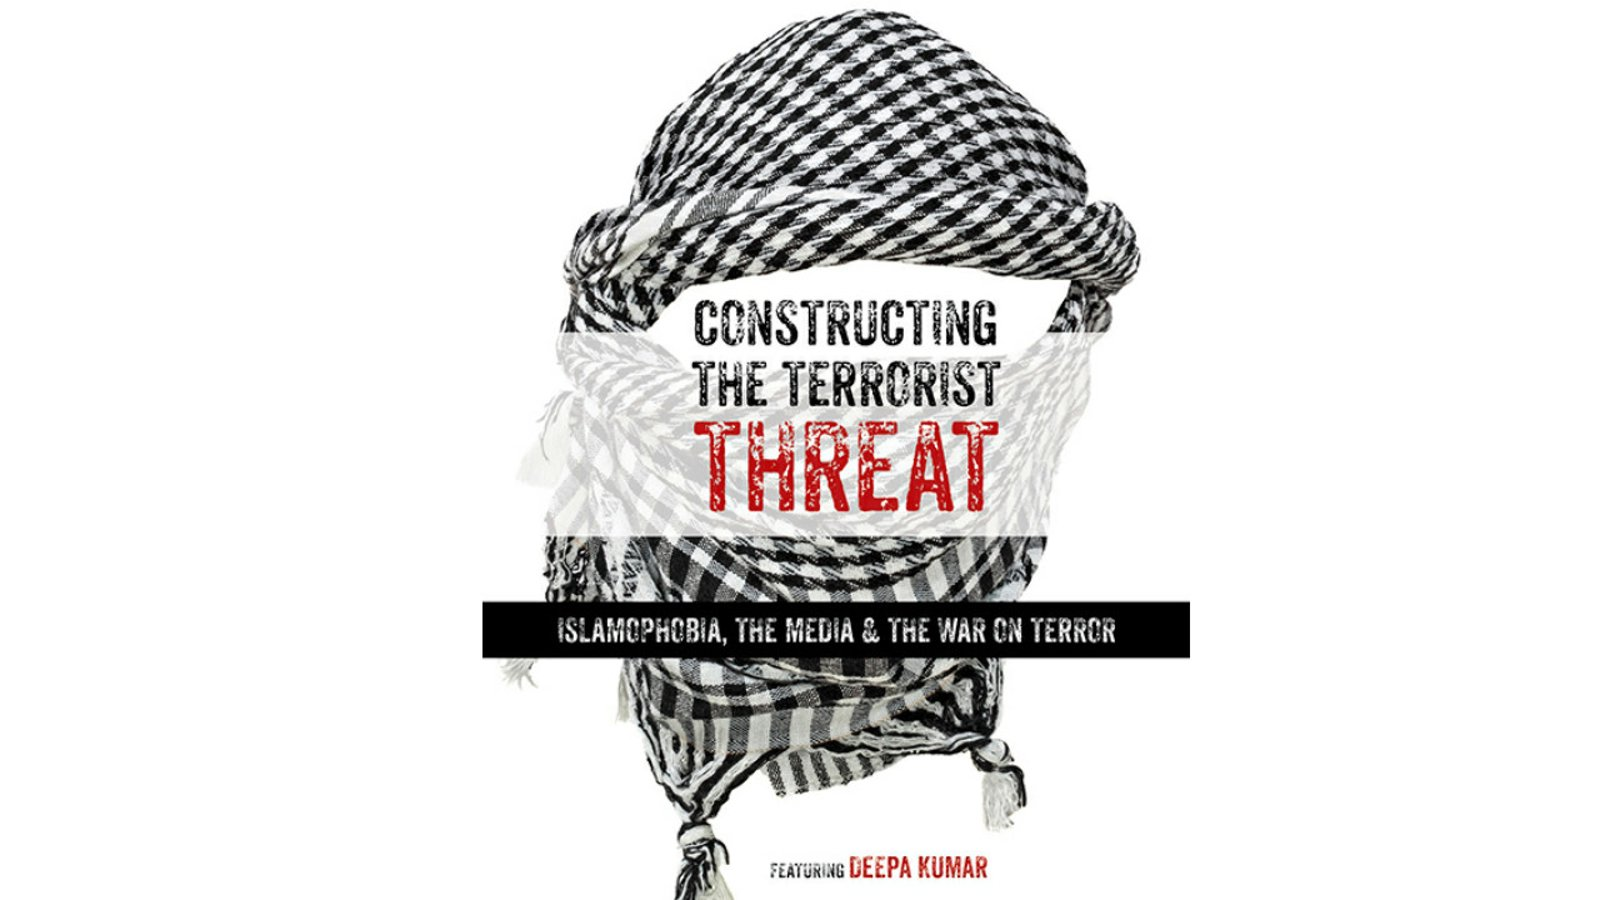 Constructing the Terrorist Threat - Islamophobia, The Media & The War on Terror